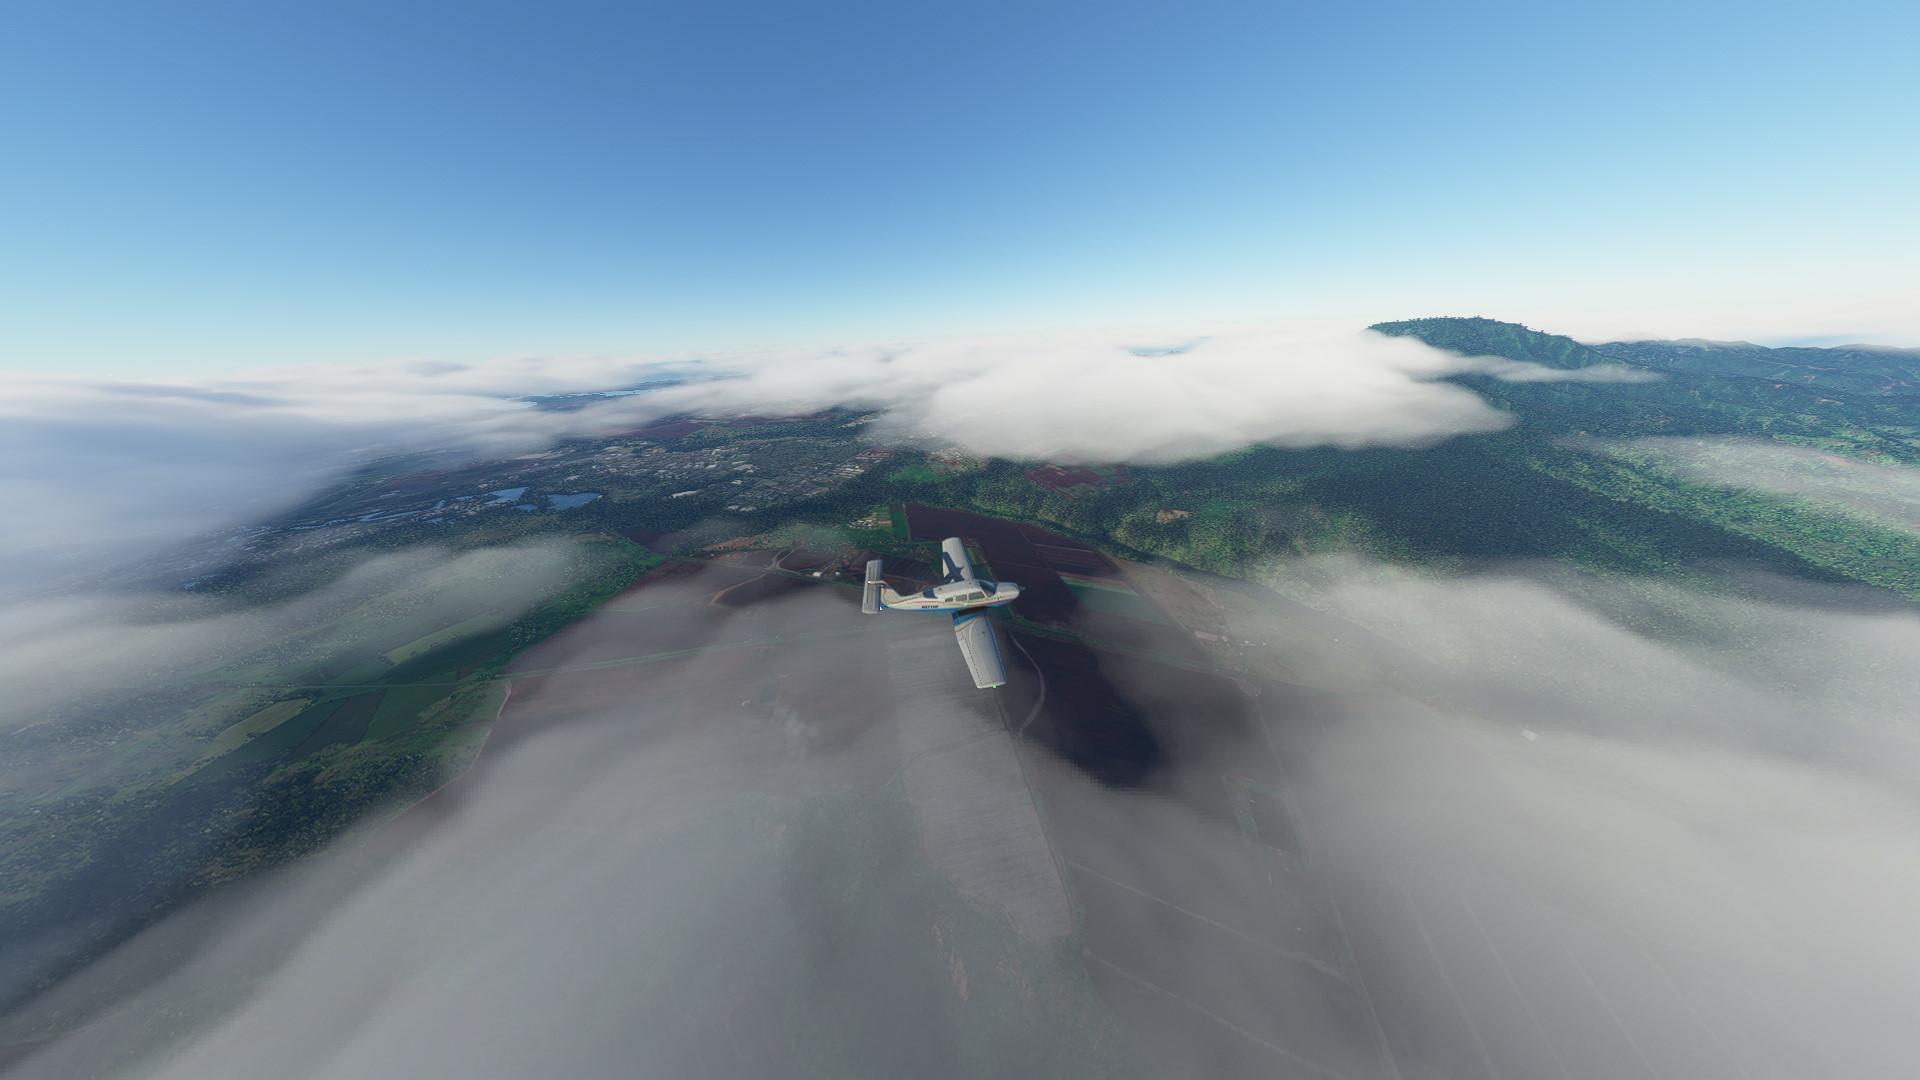 Microsoft Flight Simulator weather clouds camera mode